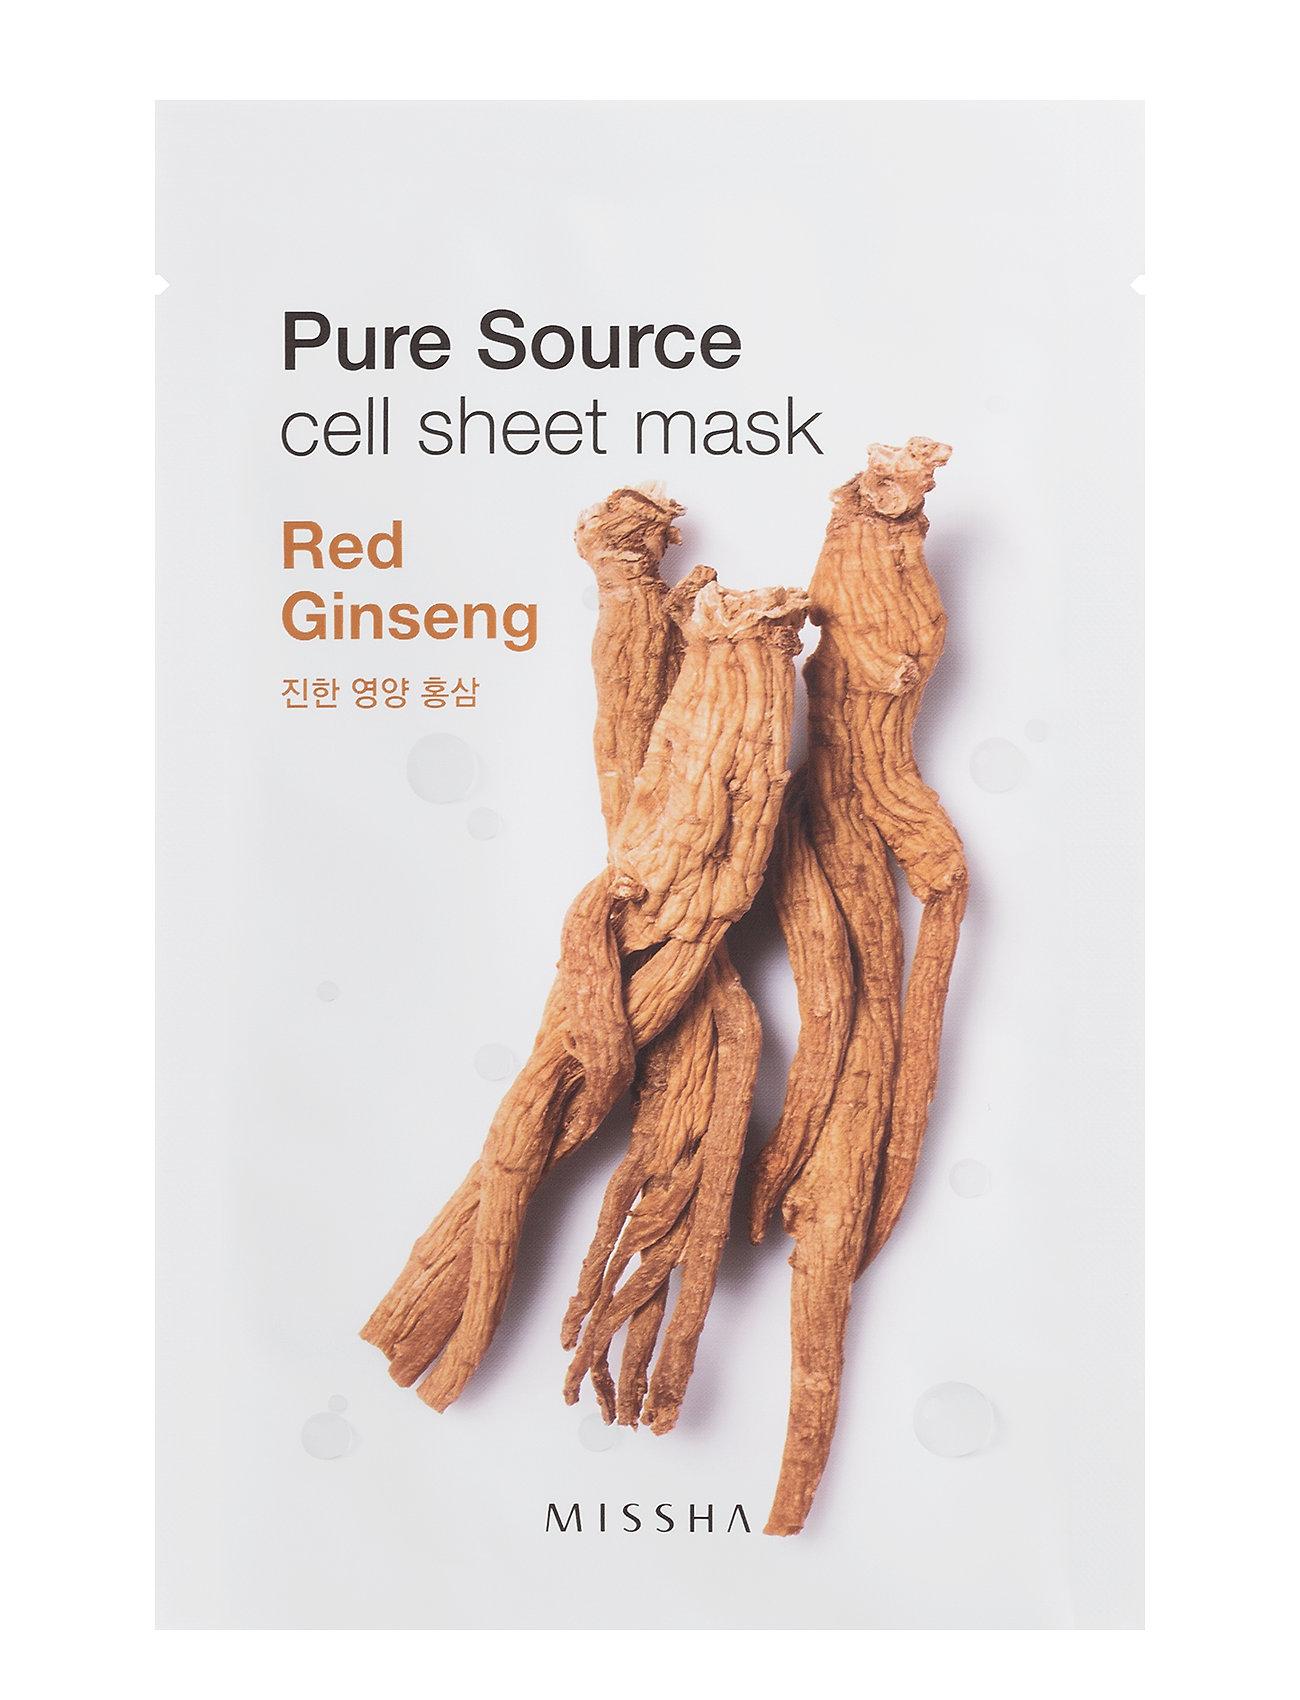 Missha Pure Source Cell Sheet Mask (Red Ginseng) - Missha